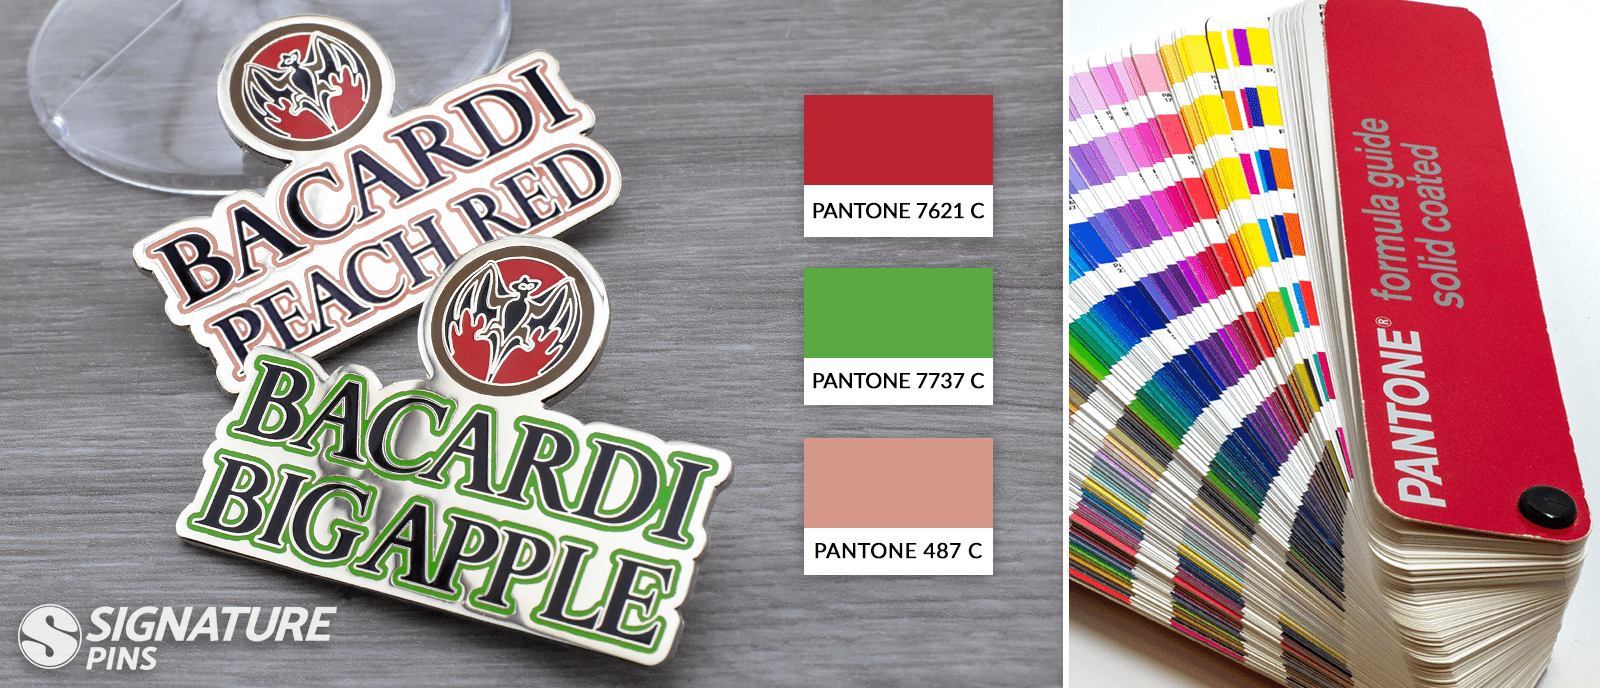 Pantone colors for lapel pins - bacardi rum pins by signature pins